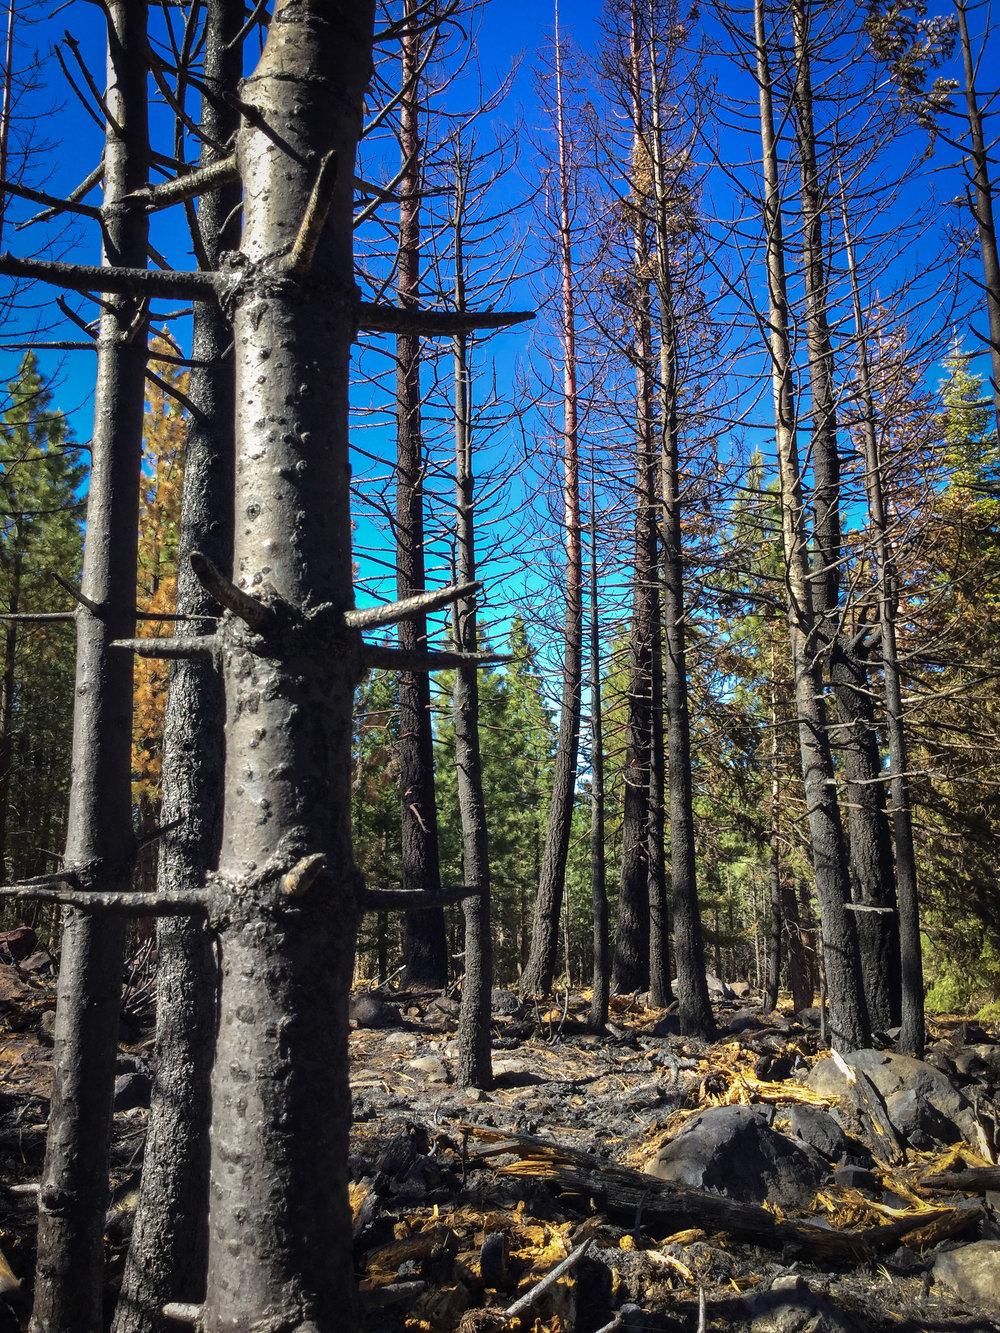 rim-fire-2013-yosemite-us-forest-service.jpg